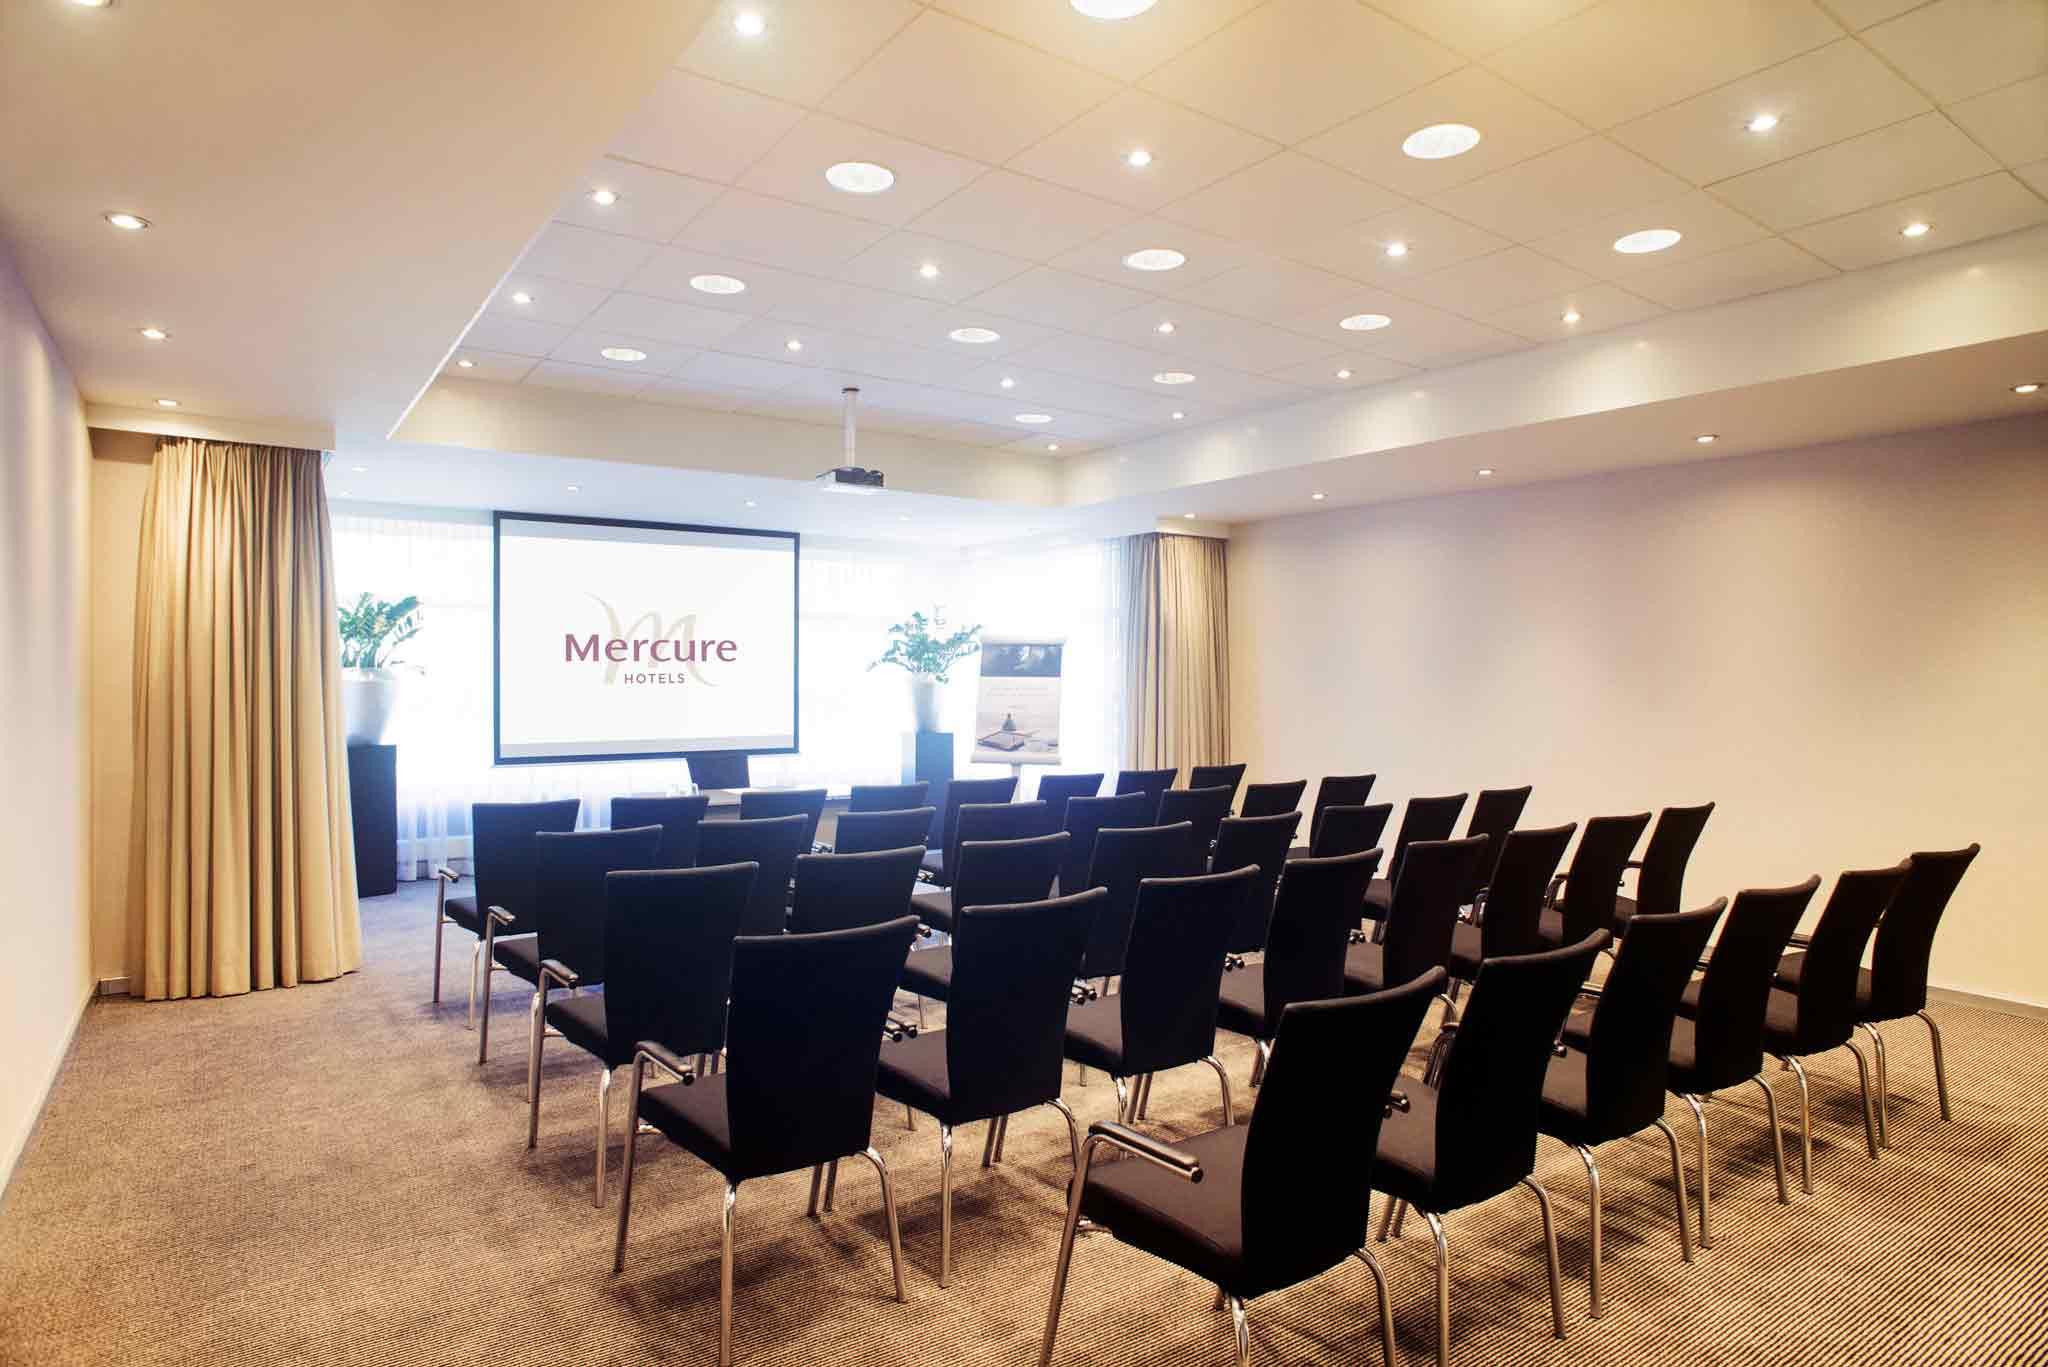 Mercure Den Haag Central Sala de conferências